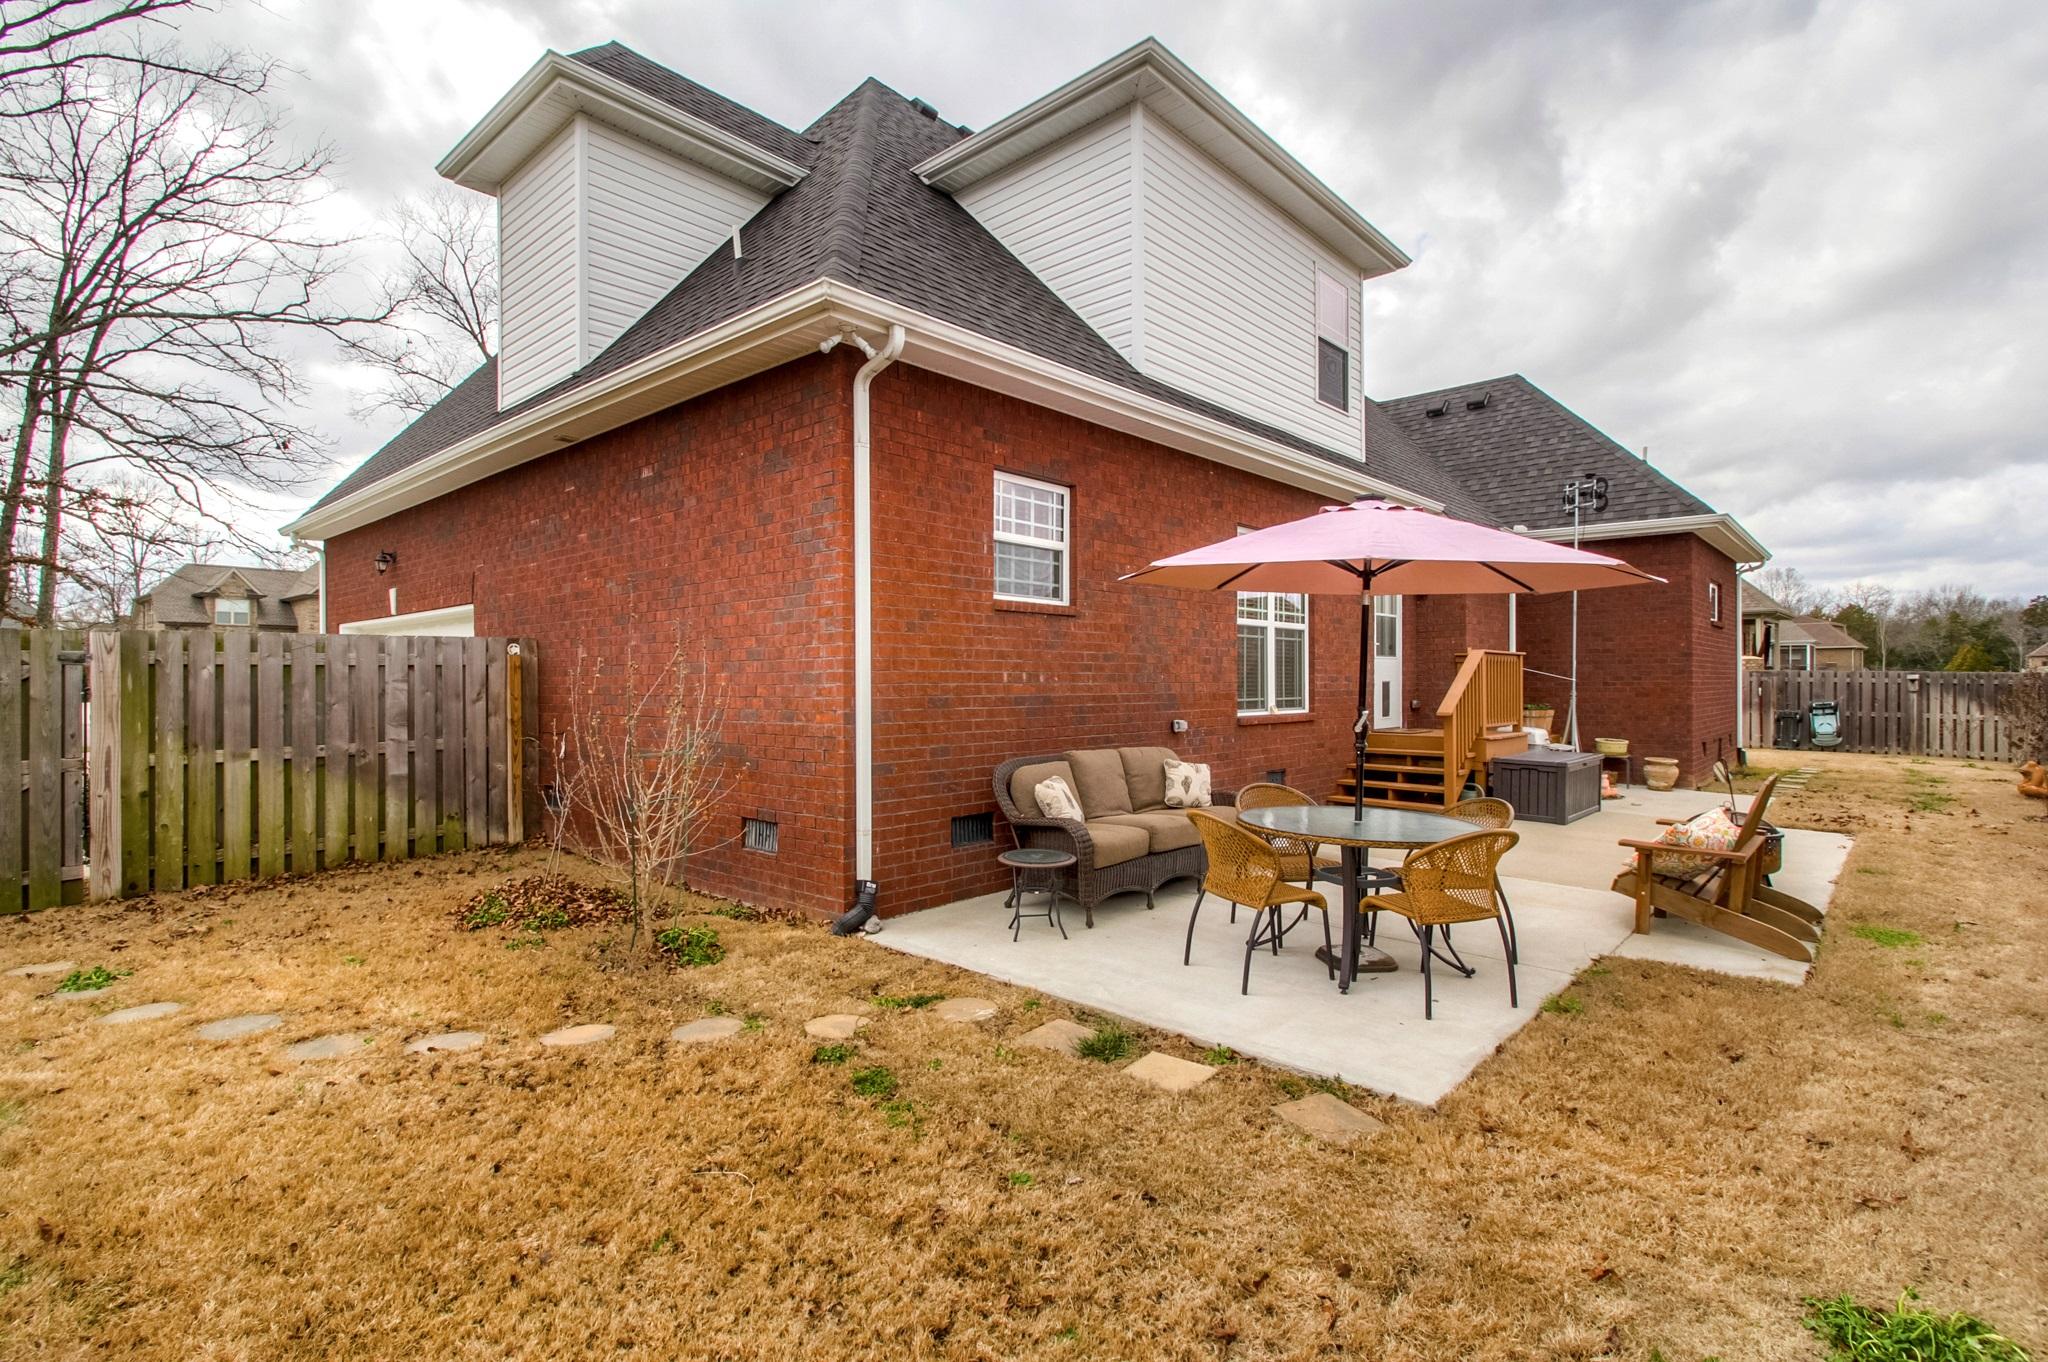 108 Sweet Bay Ct Murfeeesboro, TN(LOW-RES) (42 of 50)